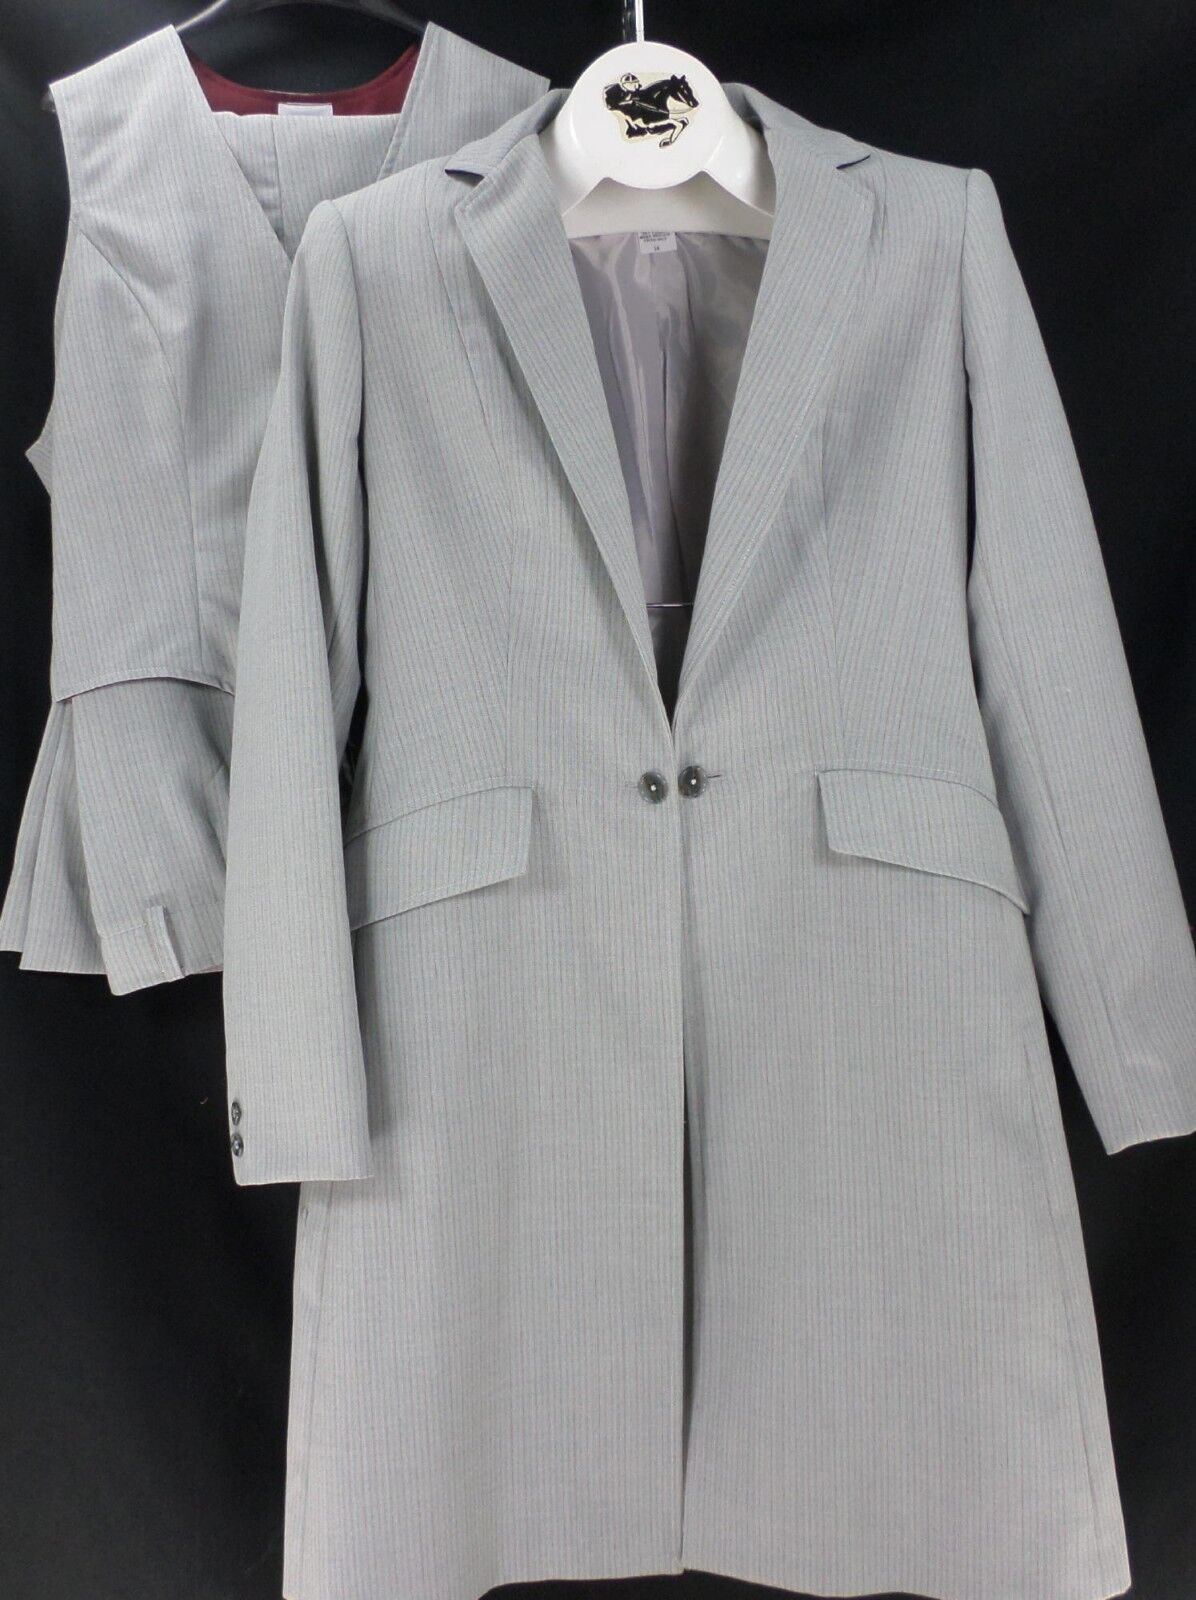 Reed Hill Saddleseat Ld 3p suit  Light grigio Pinstripe s 12  USA